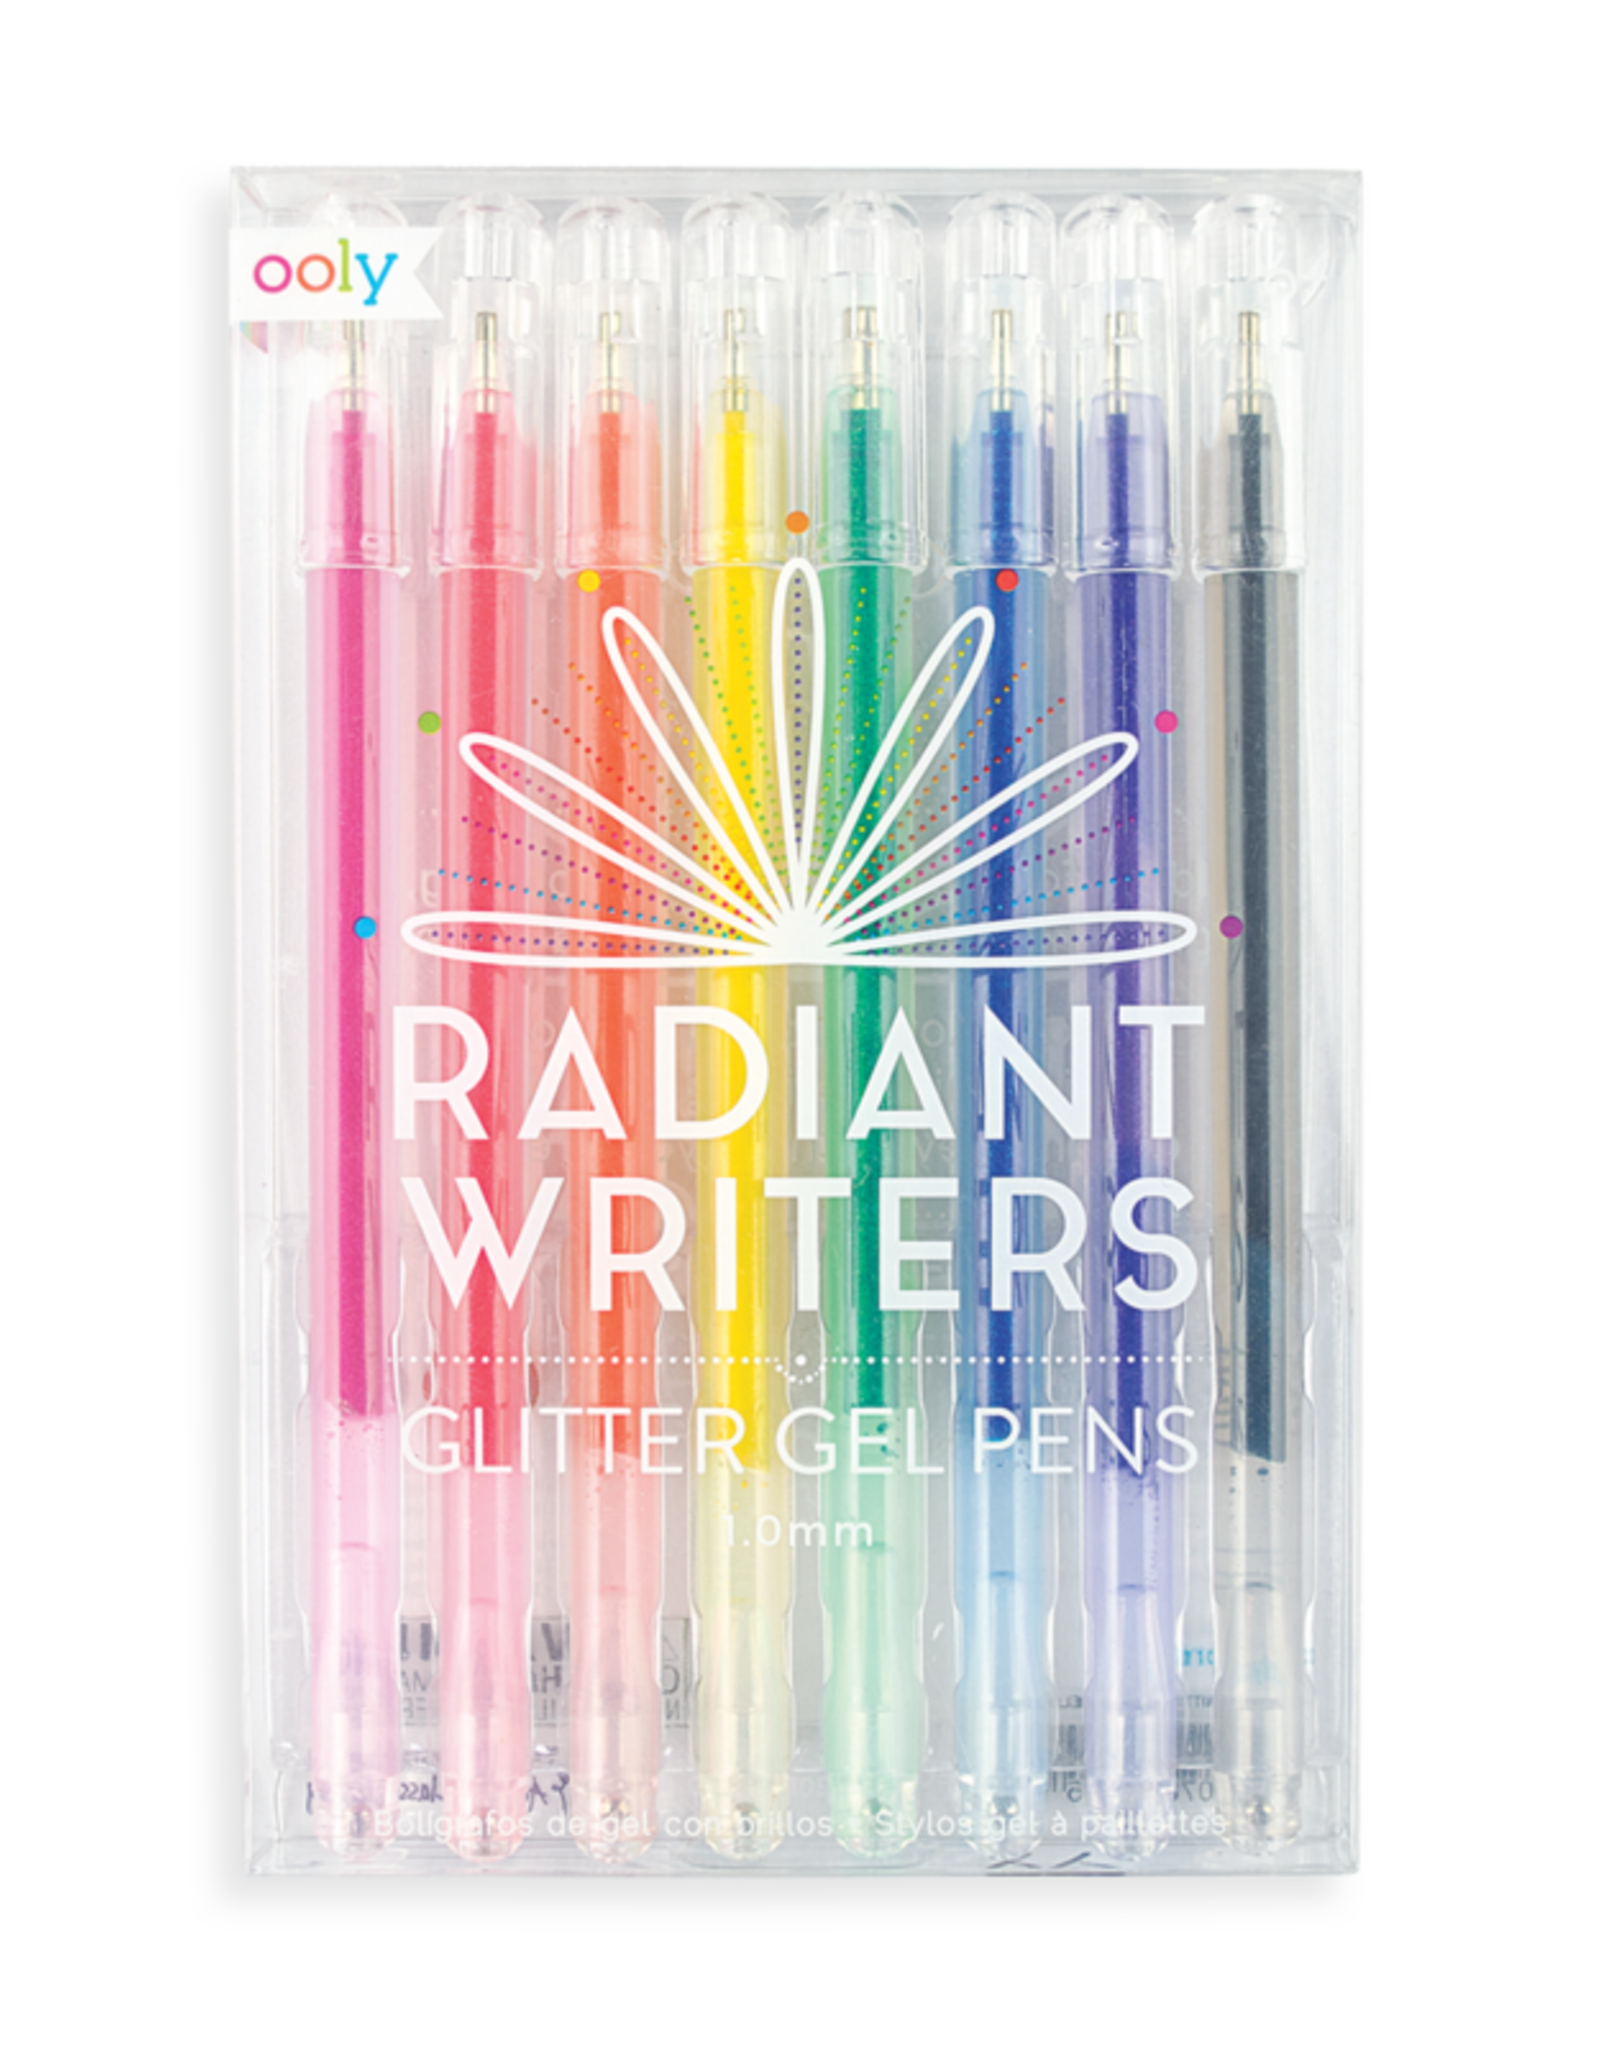 Radiant Writers Glitter Gel Pens - Set of 8